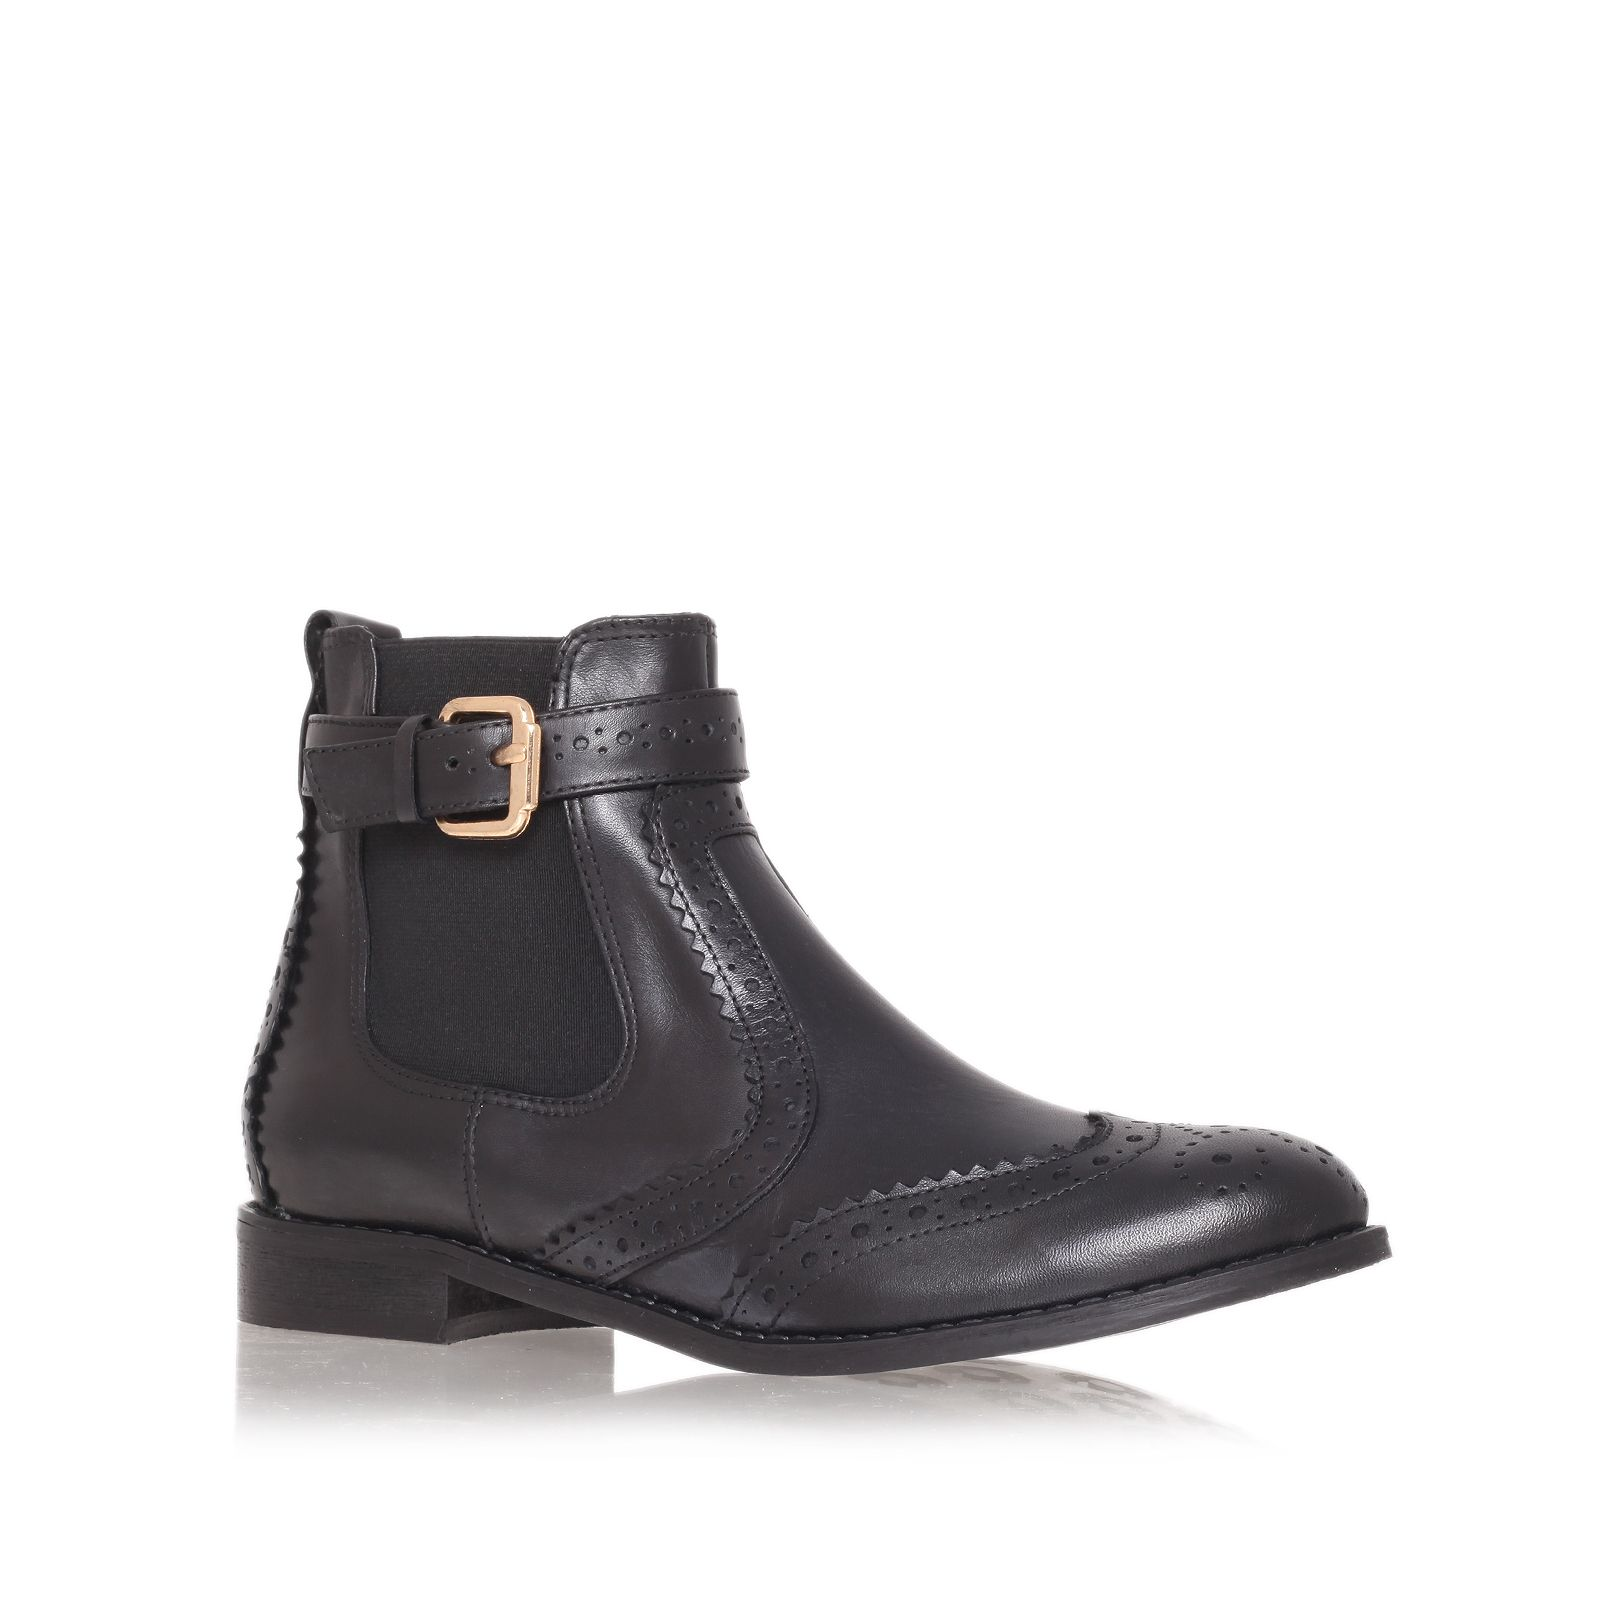 Loeffler Randall Shoes Sizing